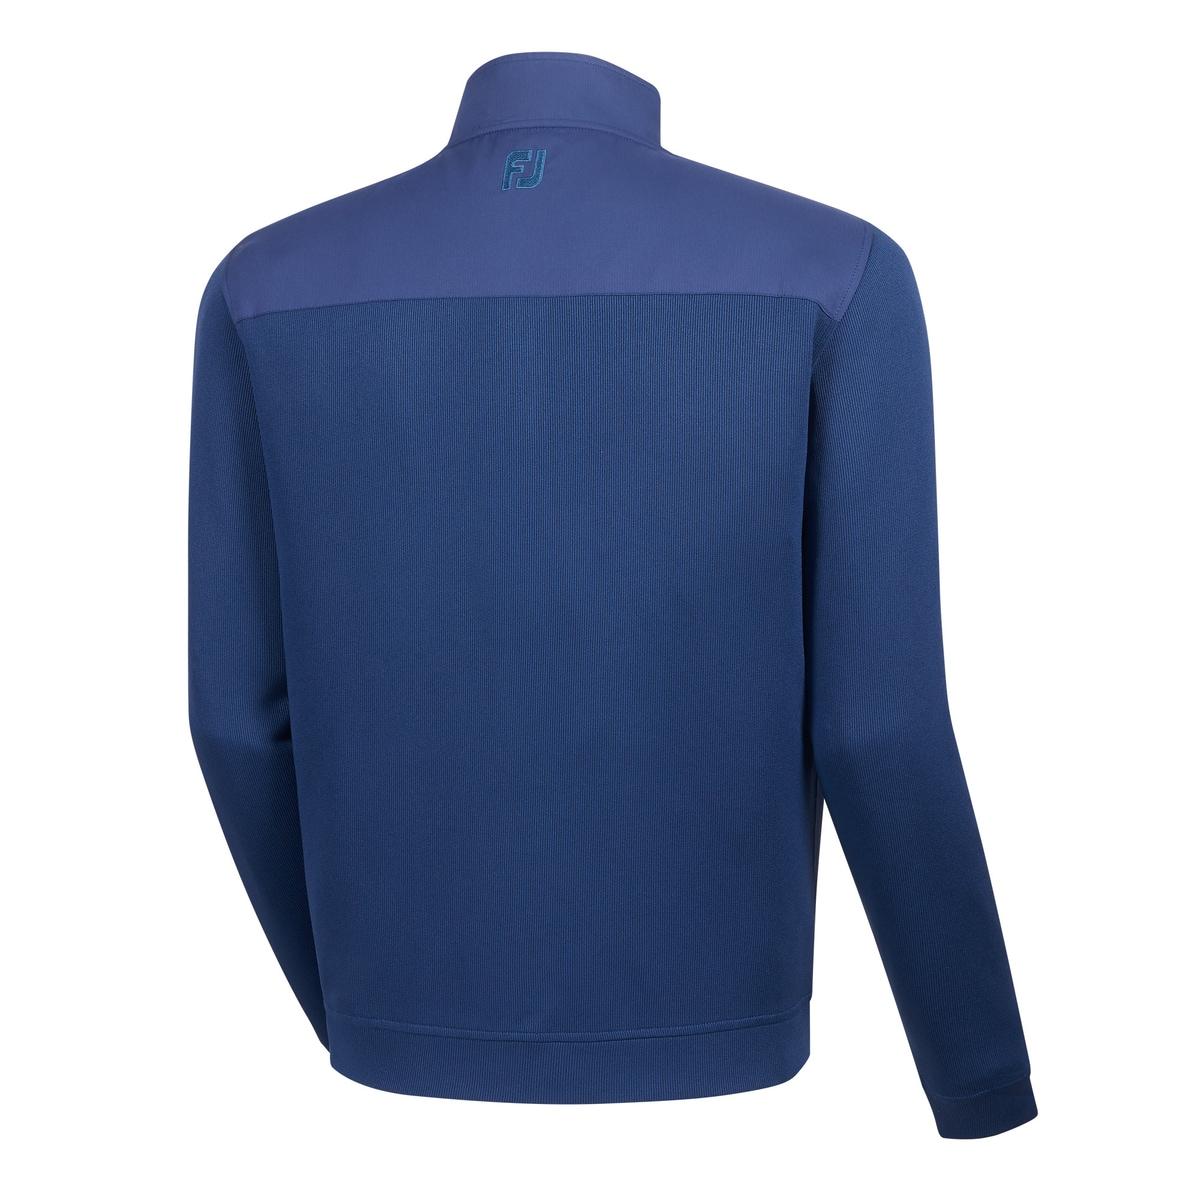 Flat Back Rib Full-Zip Mid Layer-Previous Season Style